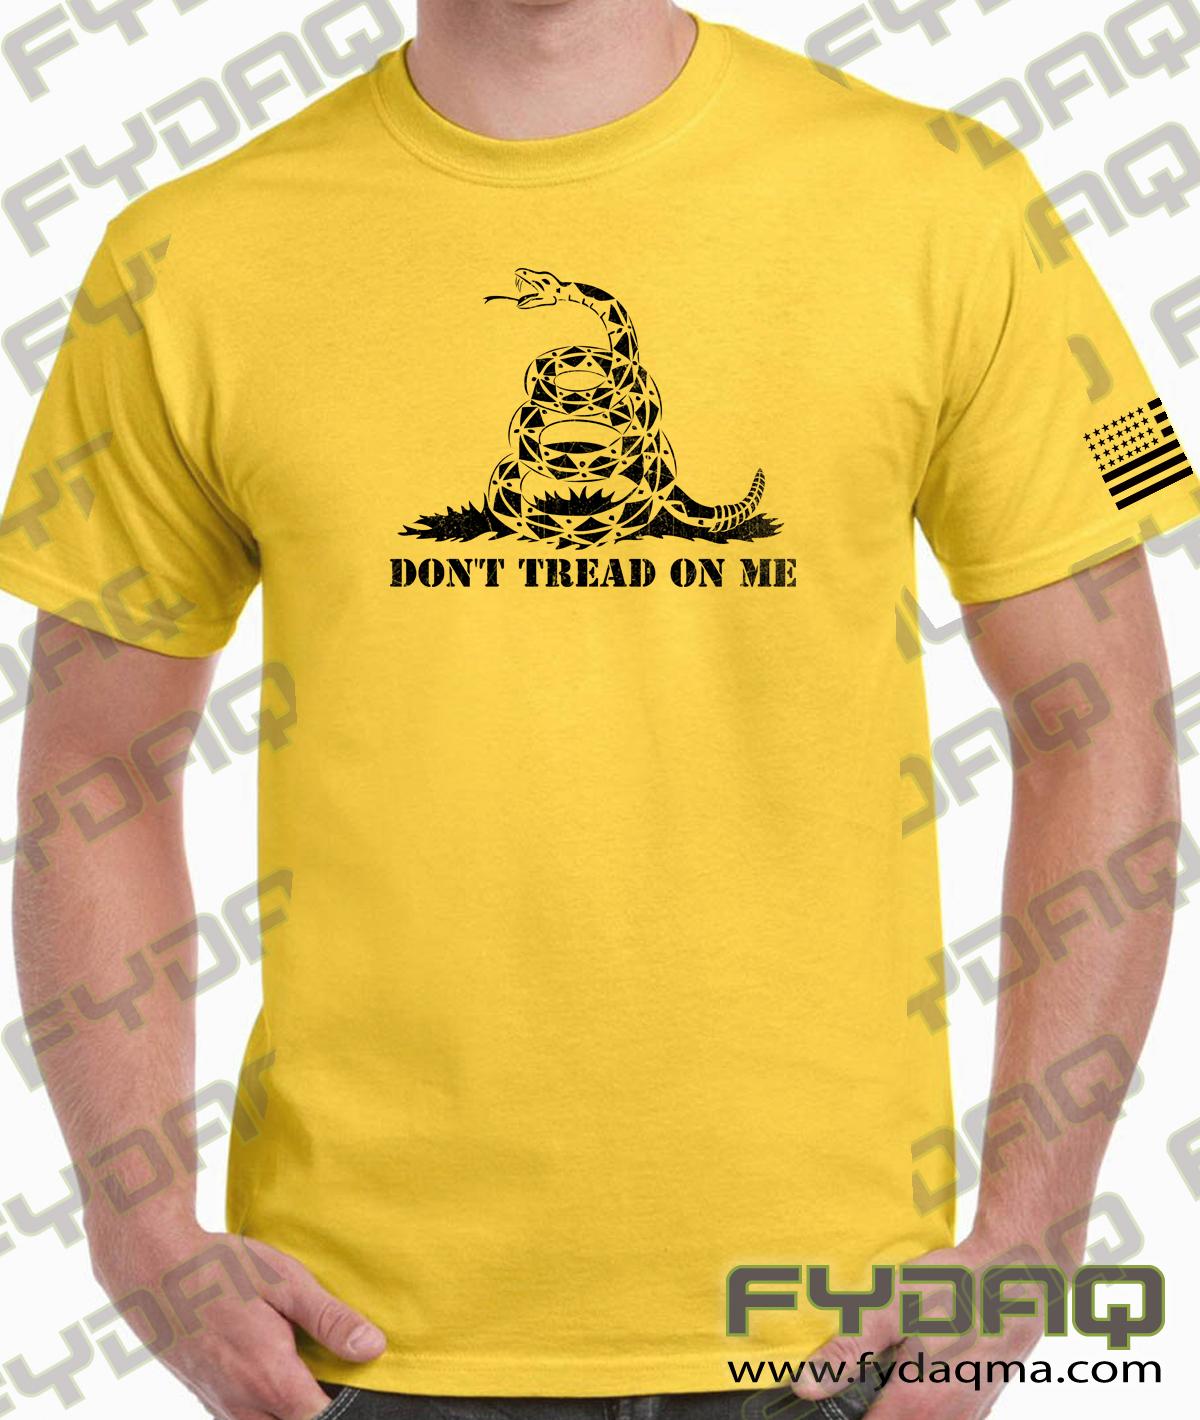 gadsden-flag-don't-tread-on-me-yellow-tshirt-fydaq